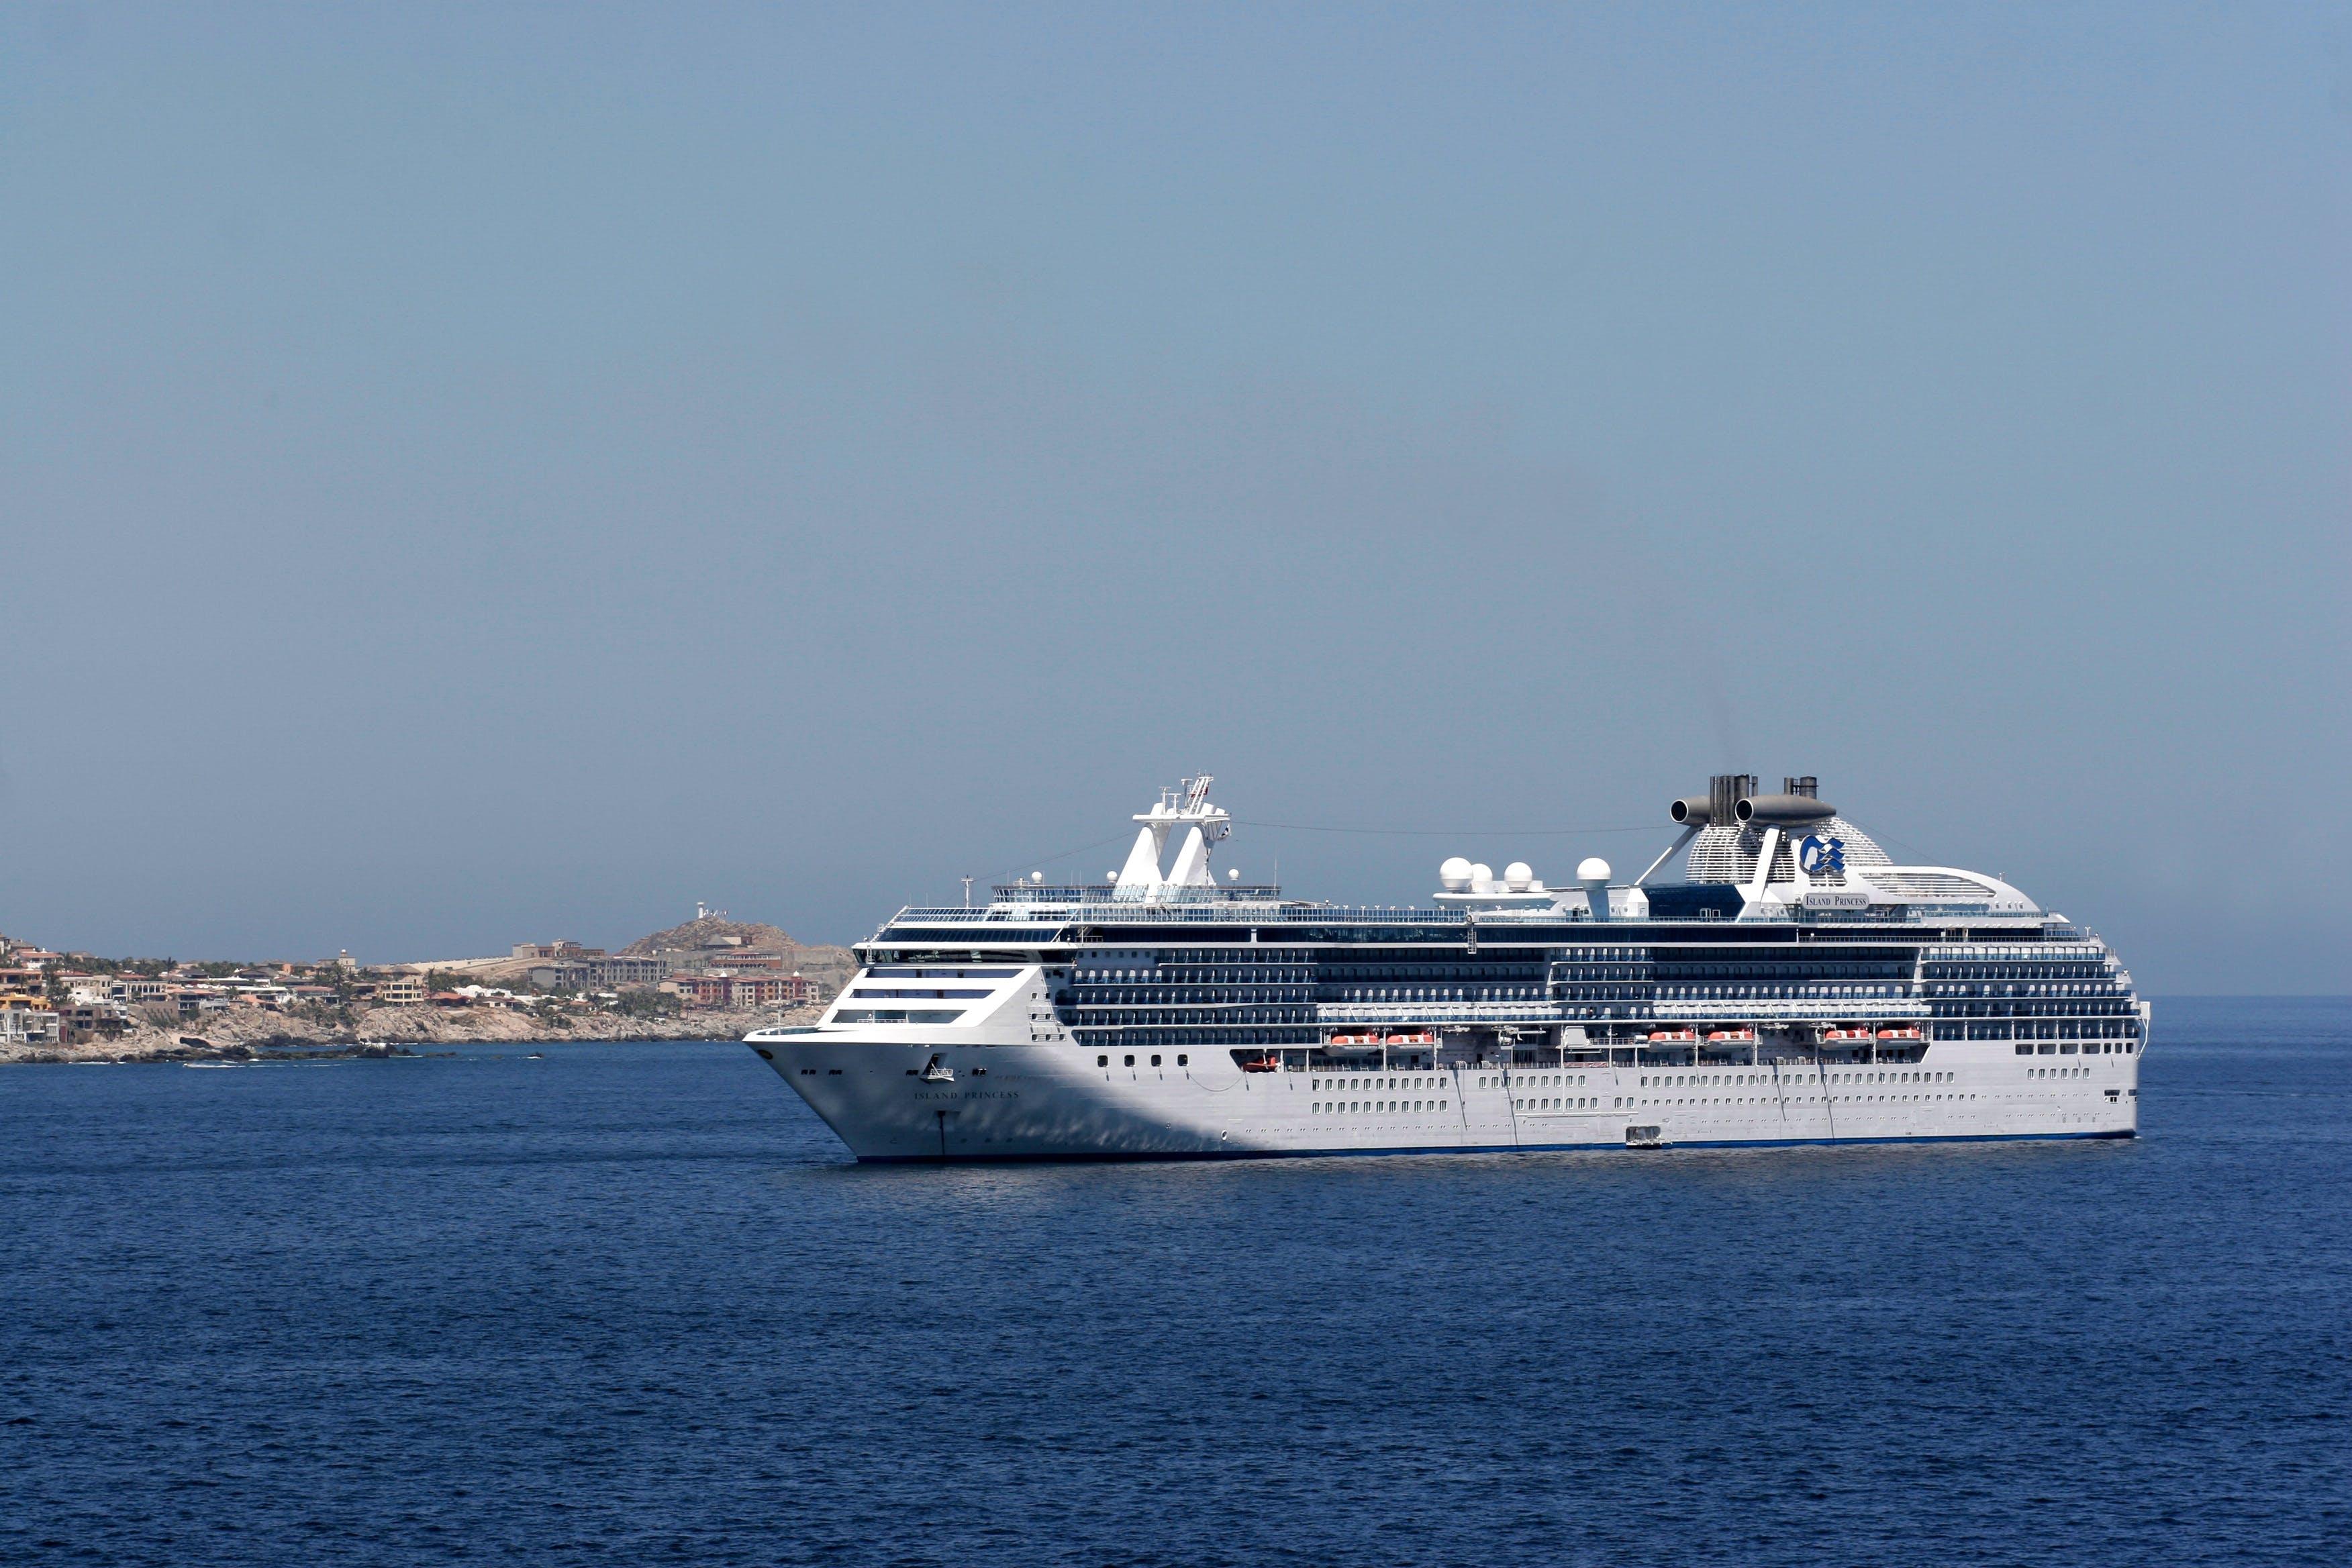 White Cruise Ship Sailing on Sea